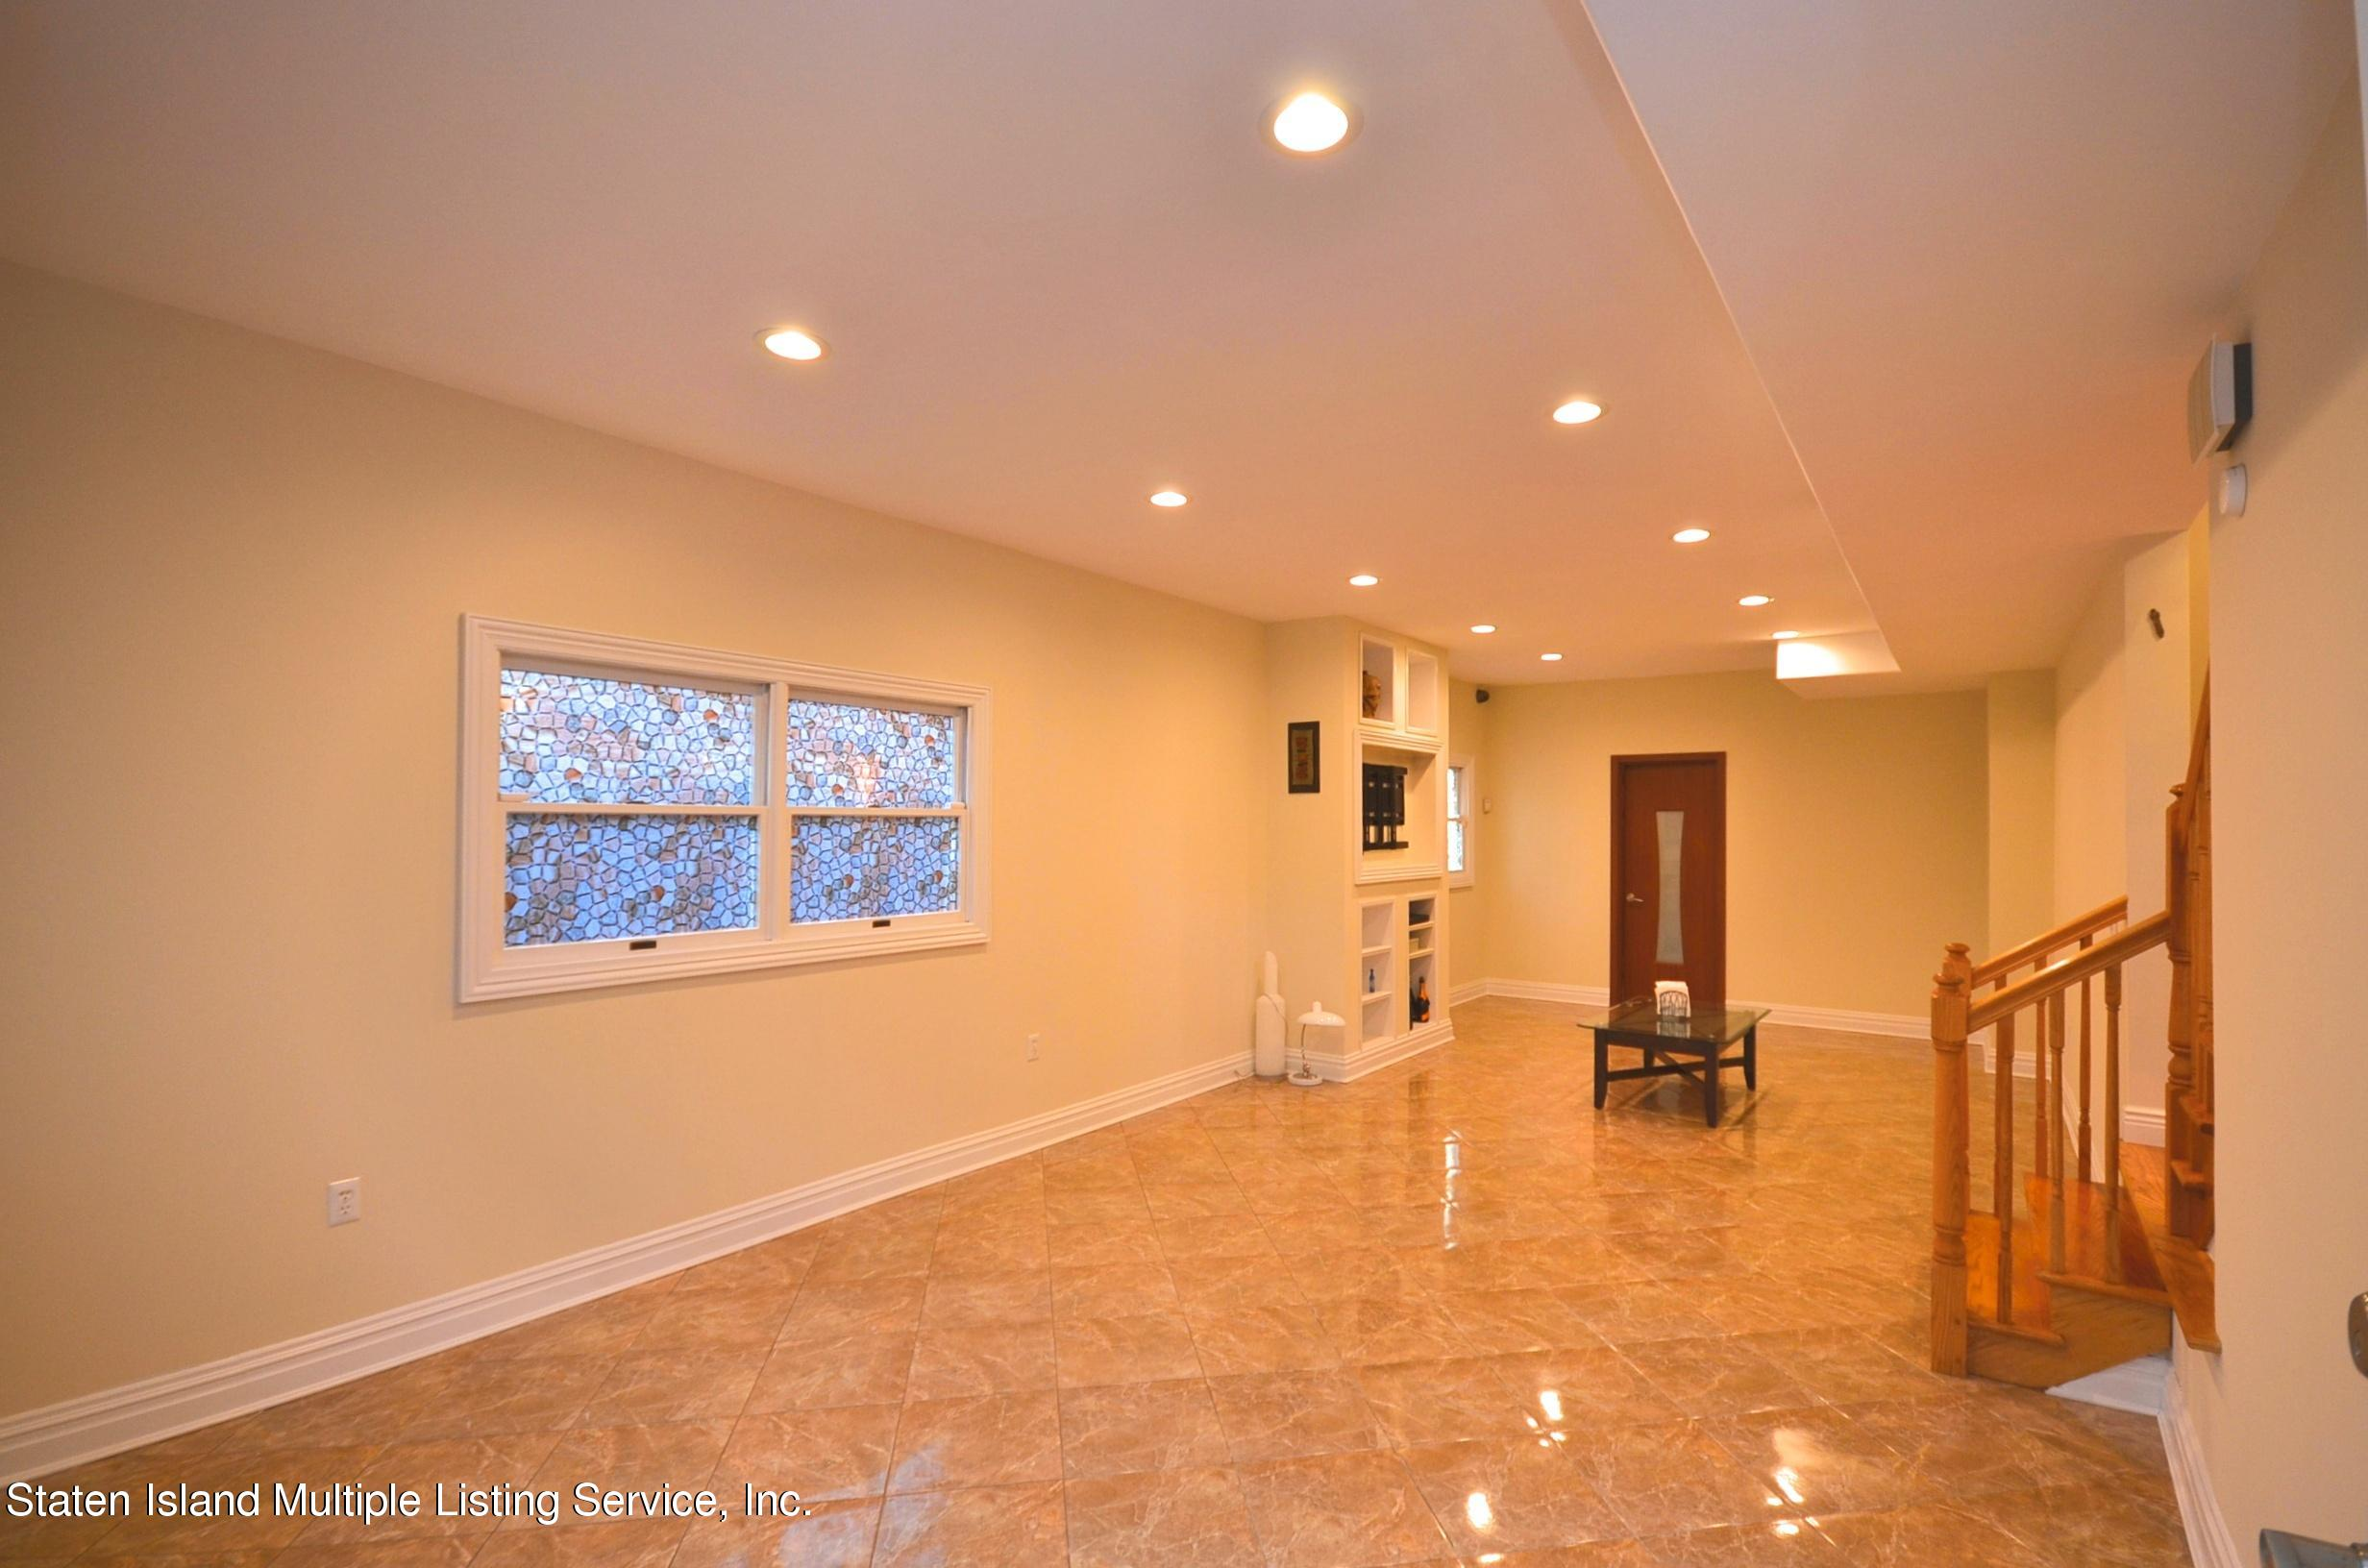 Single Family - Detached 48 Ocean Terrace  Staten Island, NY 10314, MLS-1142240-27